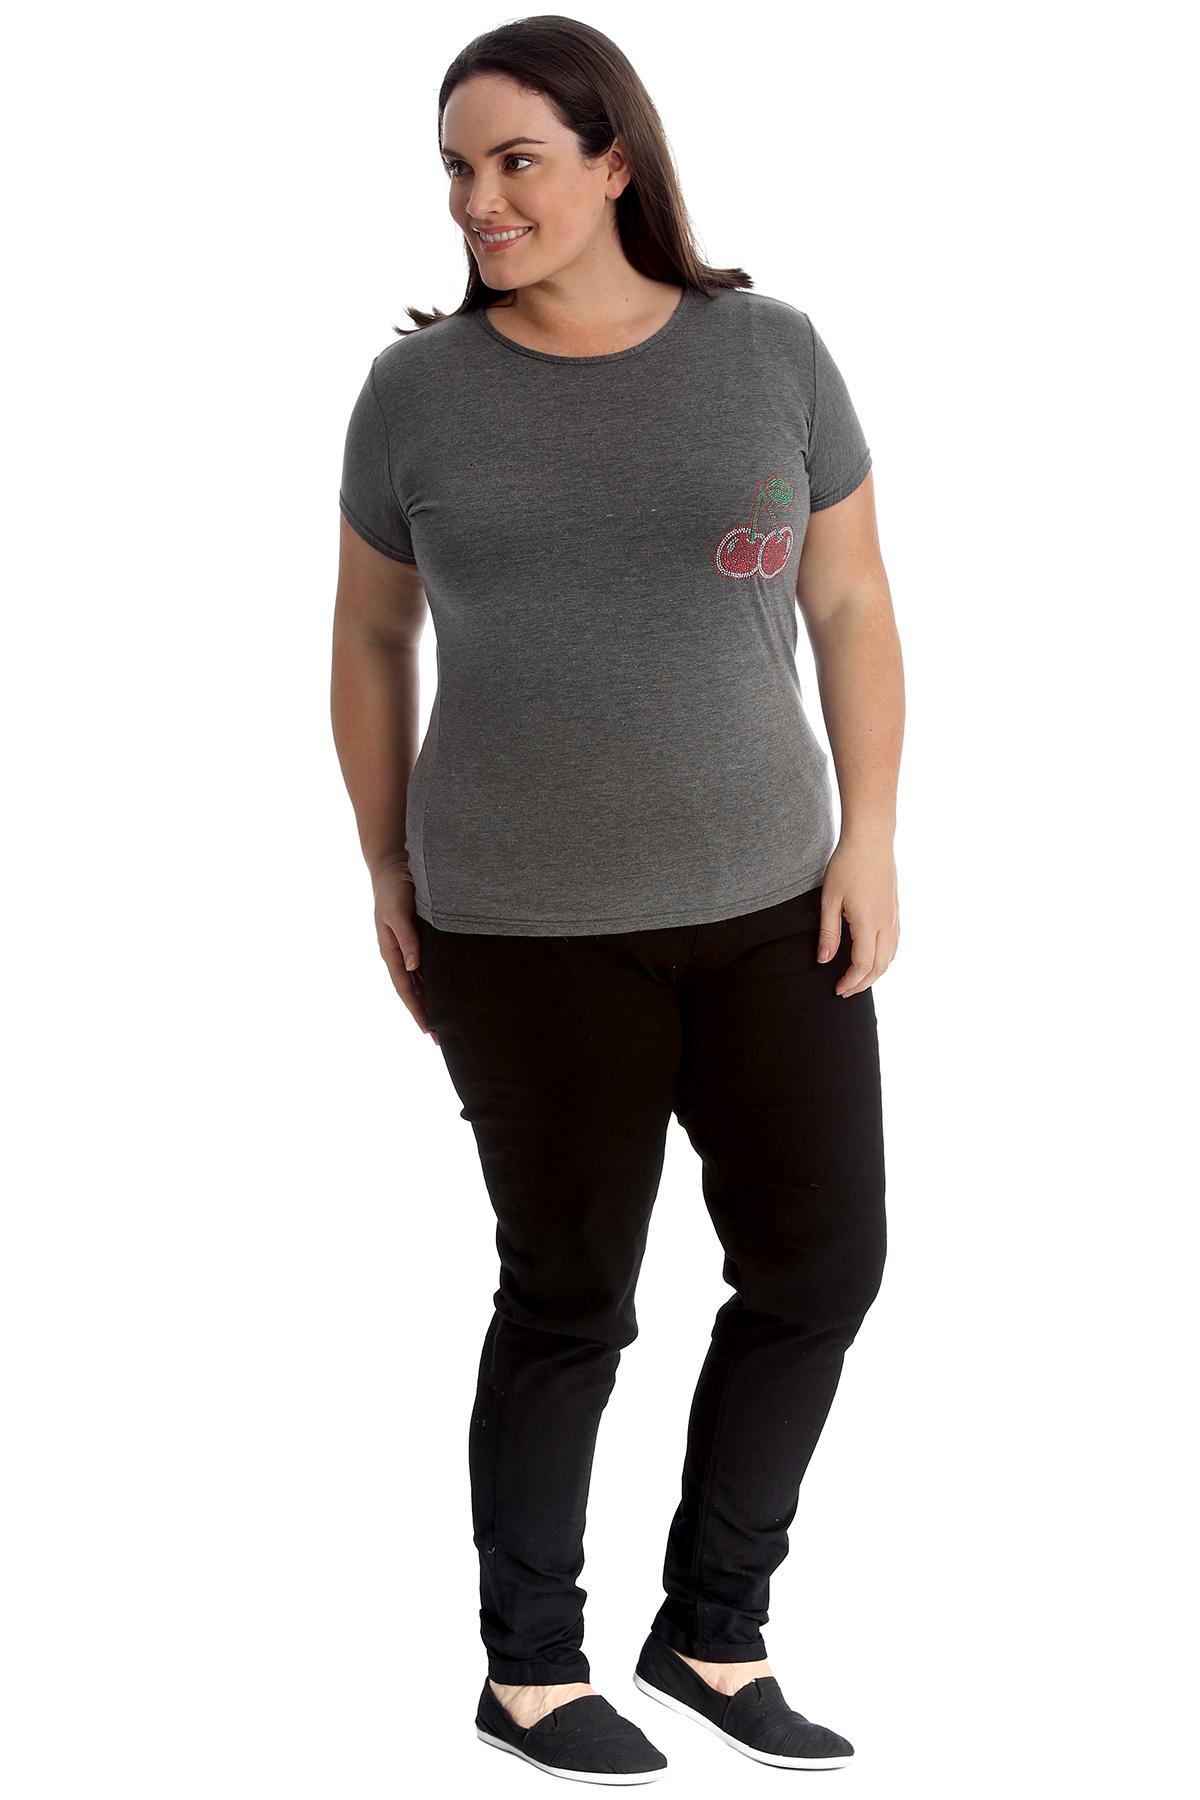 New-Womens-Plus-Size-Top-Ladies-Cherry-Rhinestone-T-Shirt-Soft-Stud-Shiny-Hip thumbnail 24